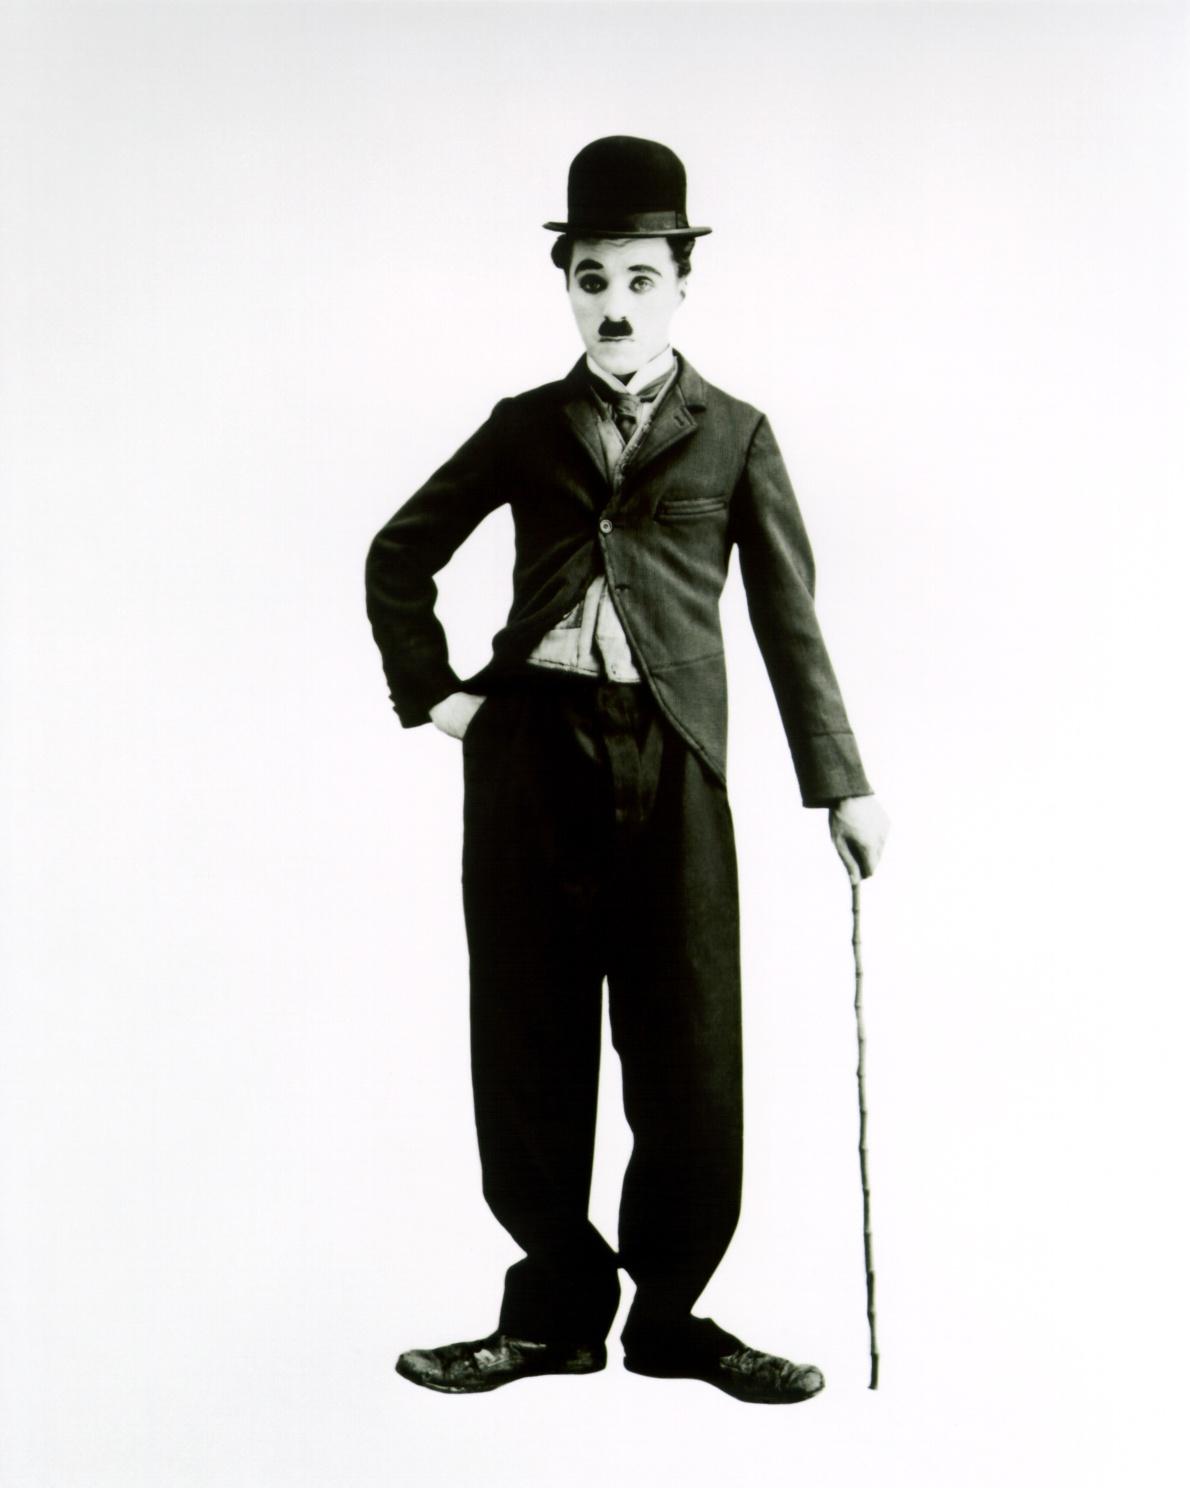 http://jerome.boulinguez.free.fr/english/img/Charlie_Chaplin.jpg